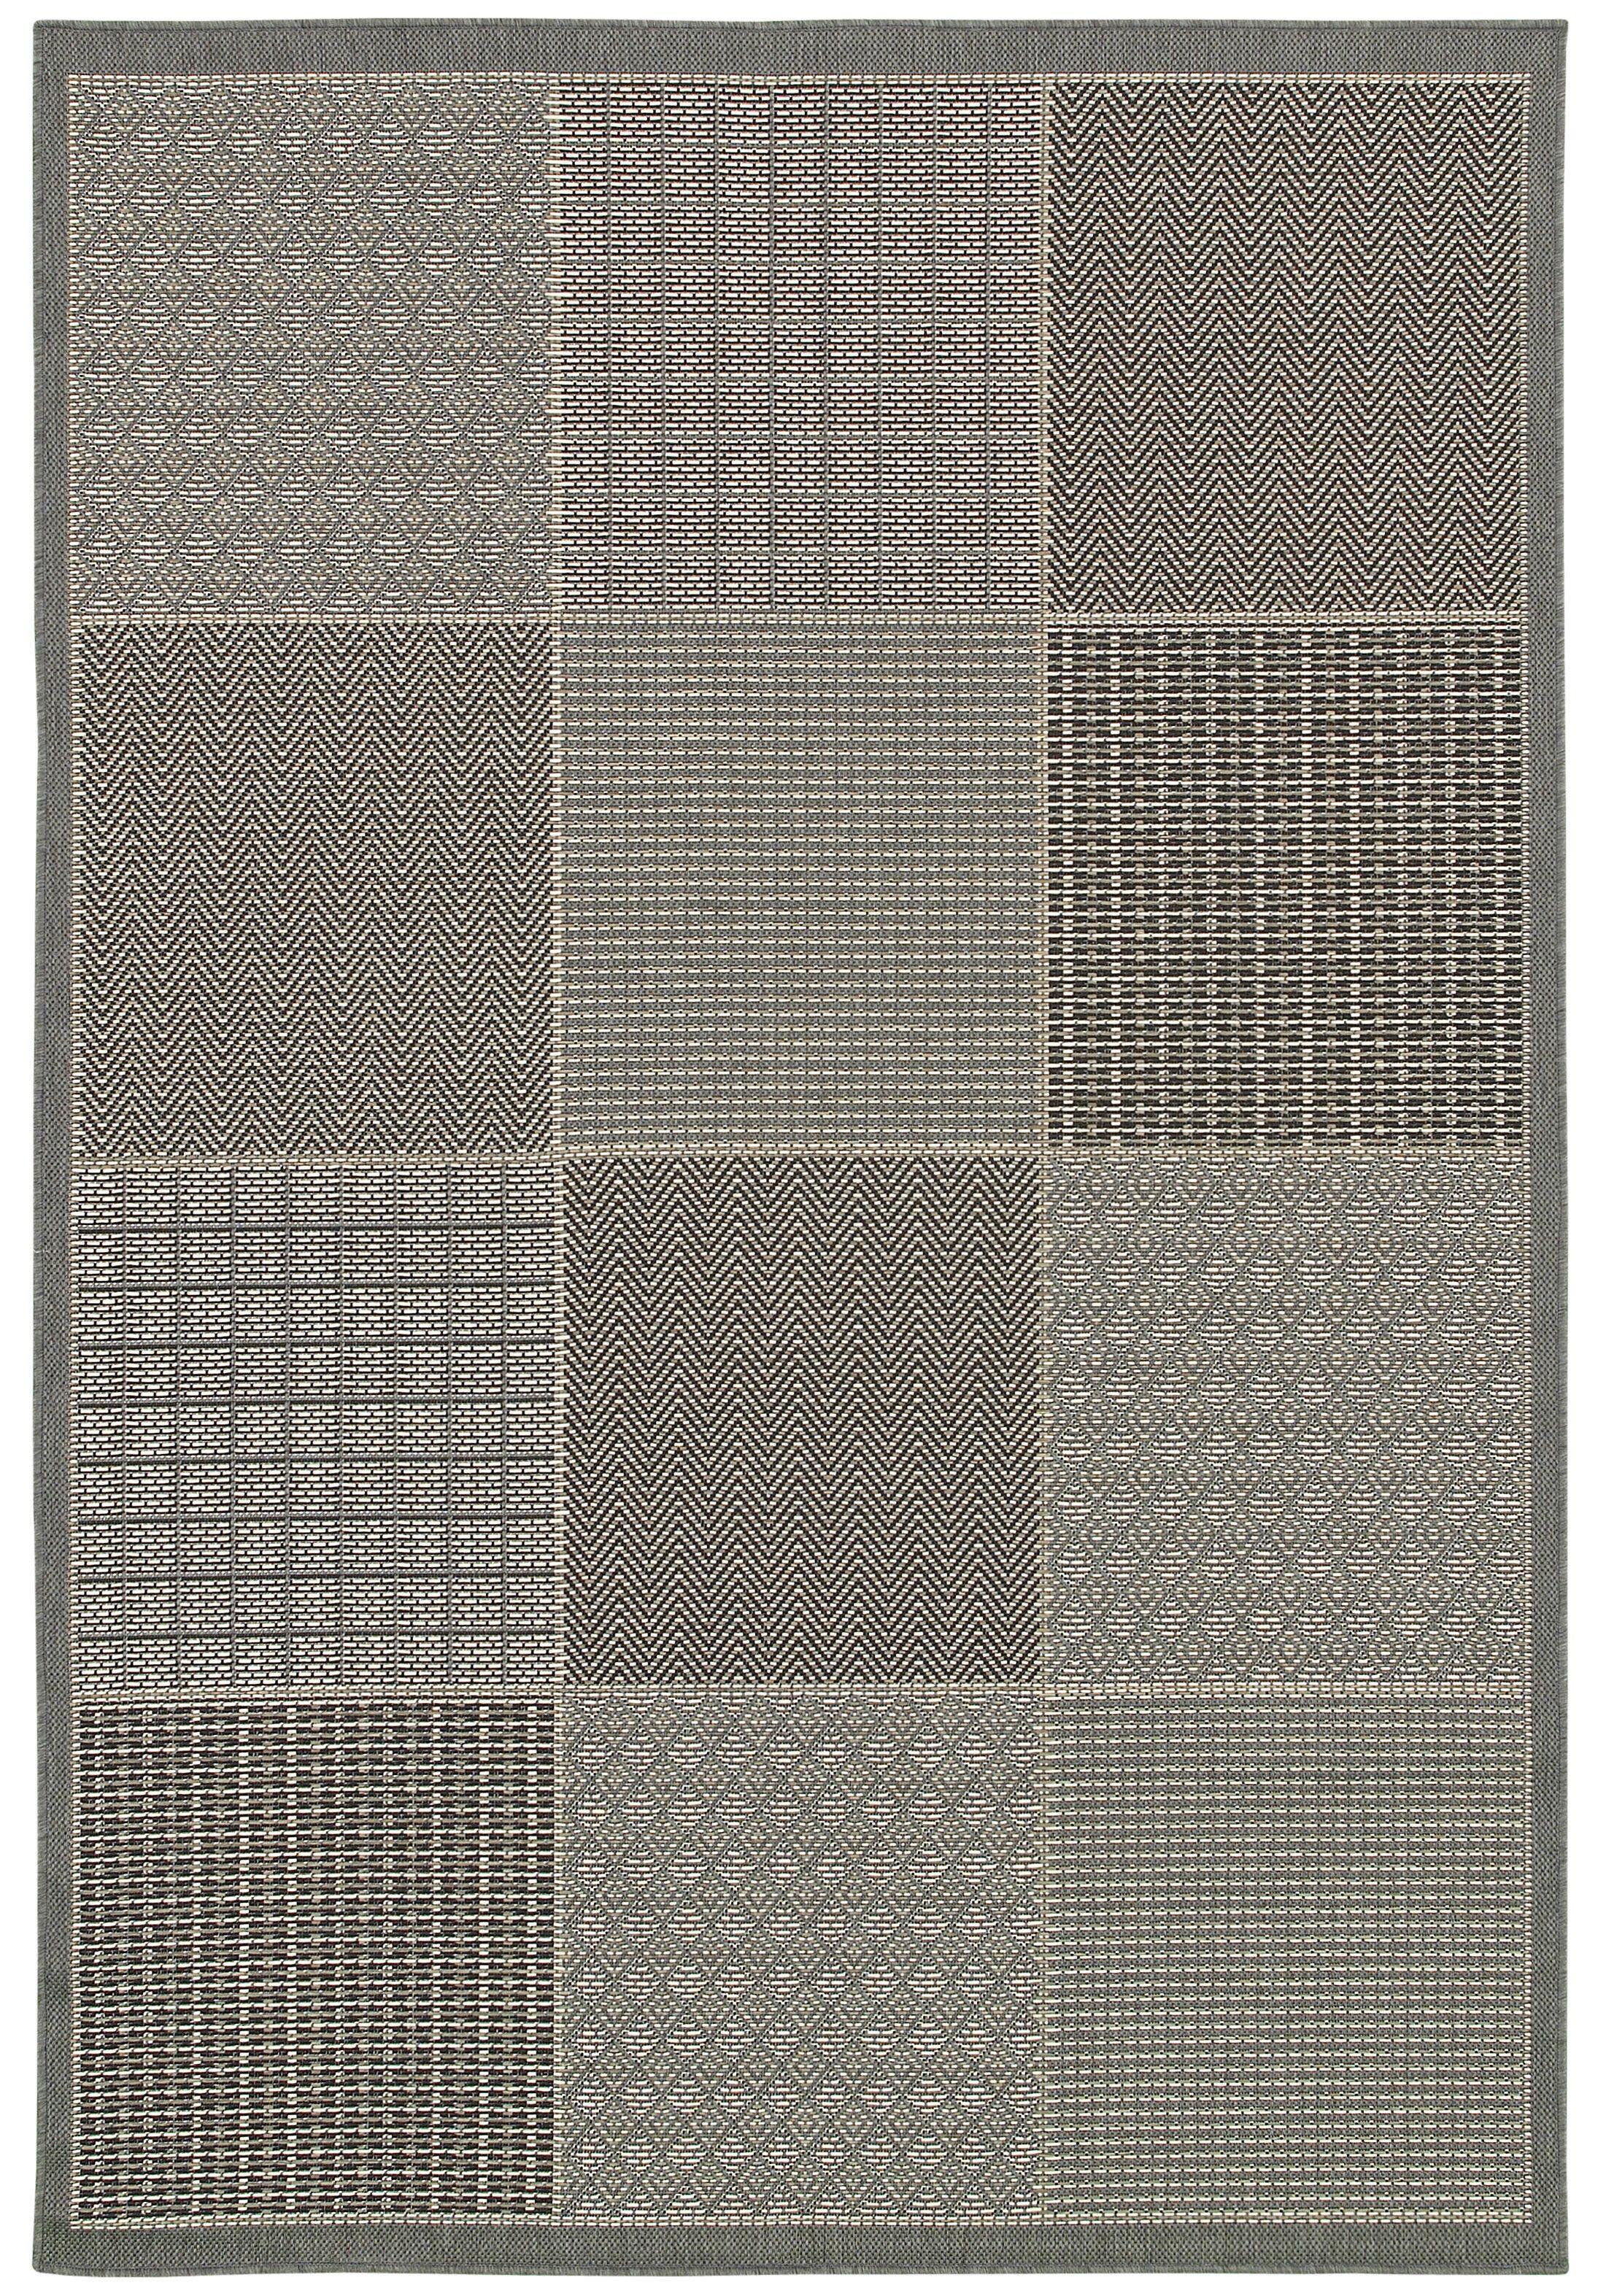 Millbourne Gray Indoor/Outdoor Area Rug Rug Size: Rectangle 7'6